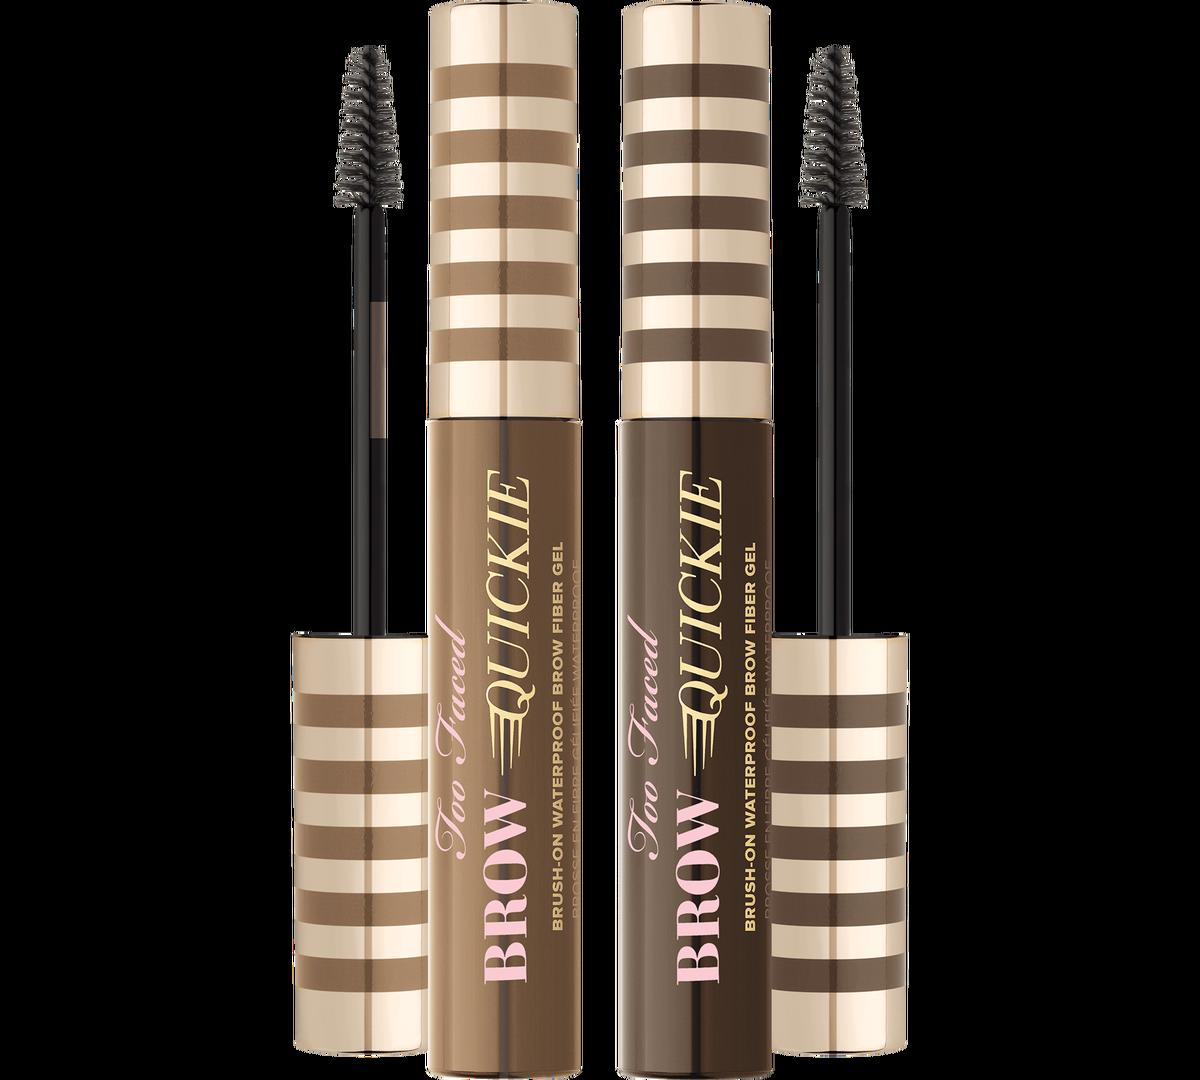 Homepage Best eyebrow products, Eyebrow makeup, Fibre gel